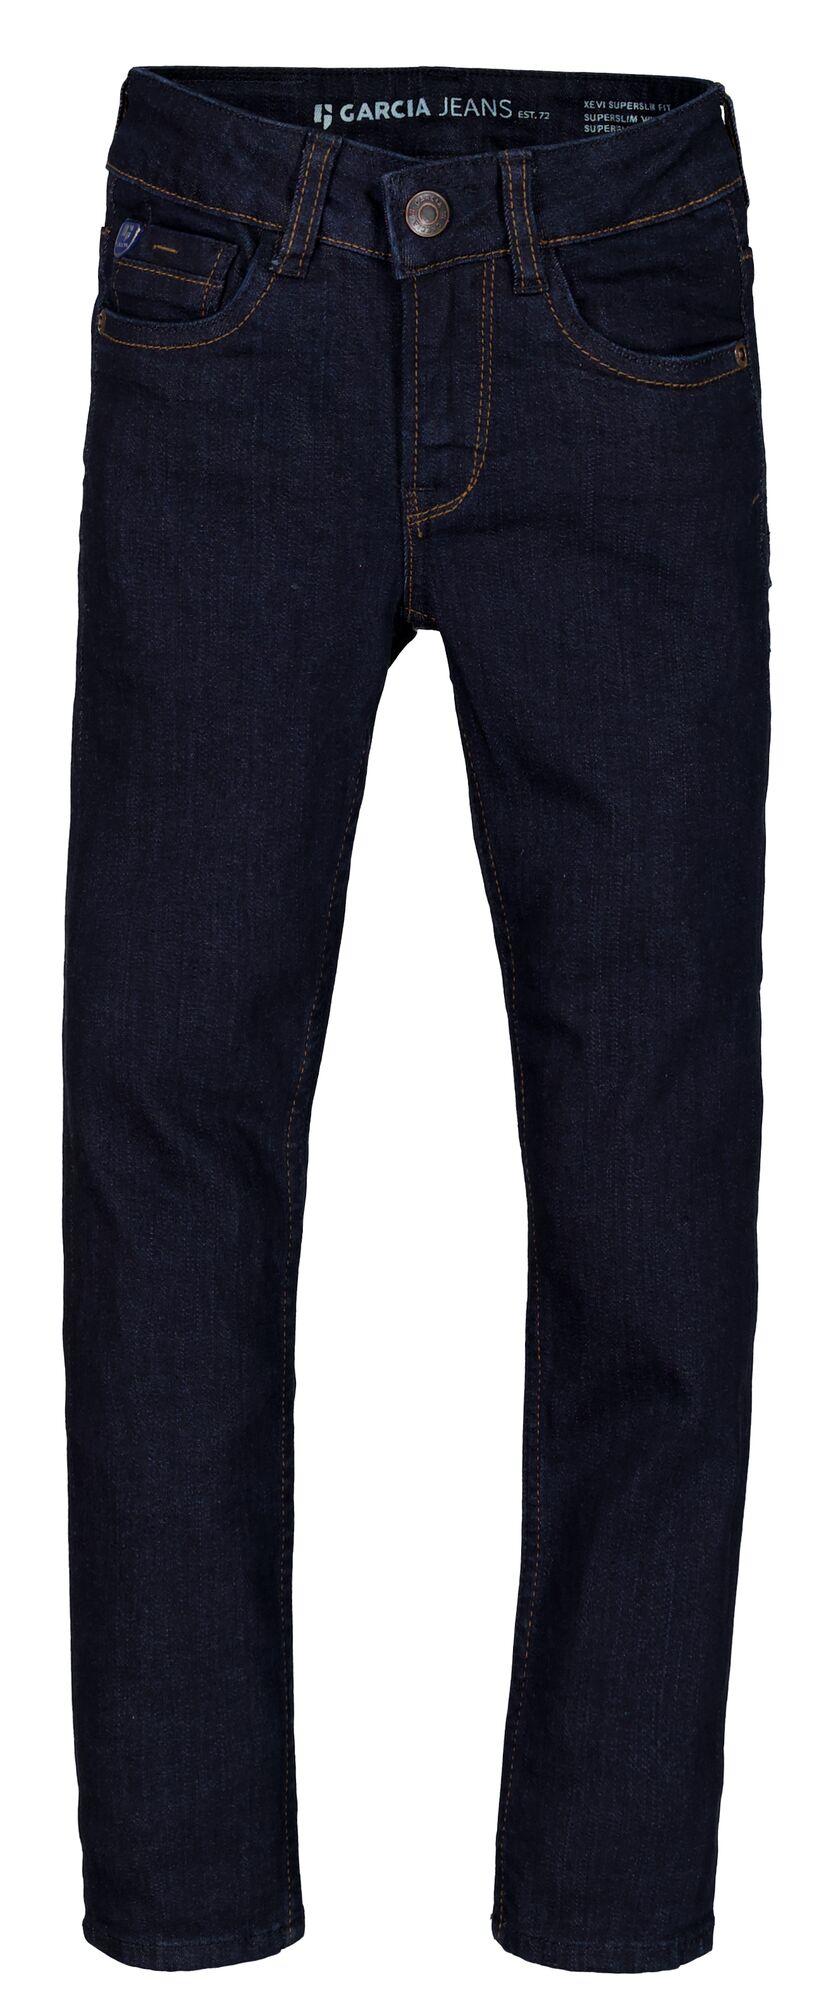 Garcia - Boys-Pants denim